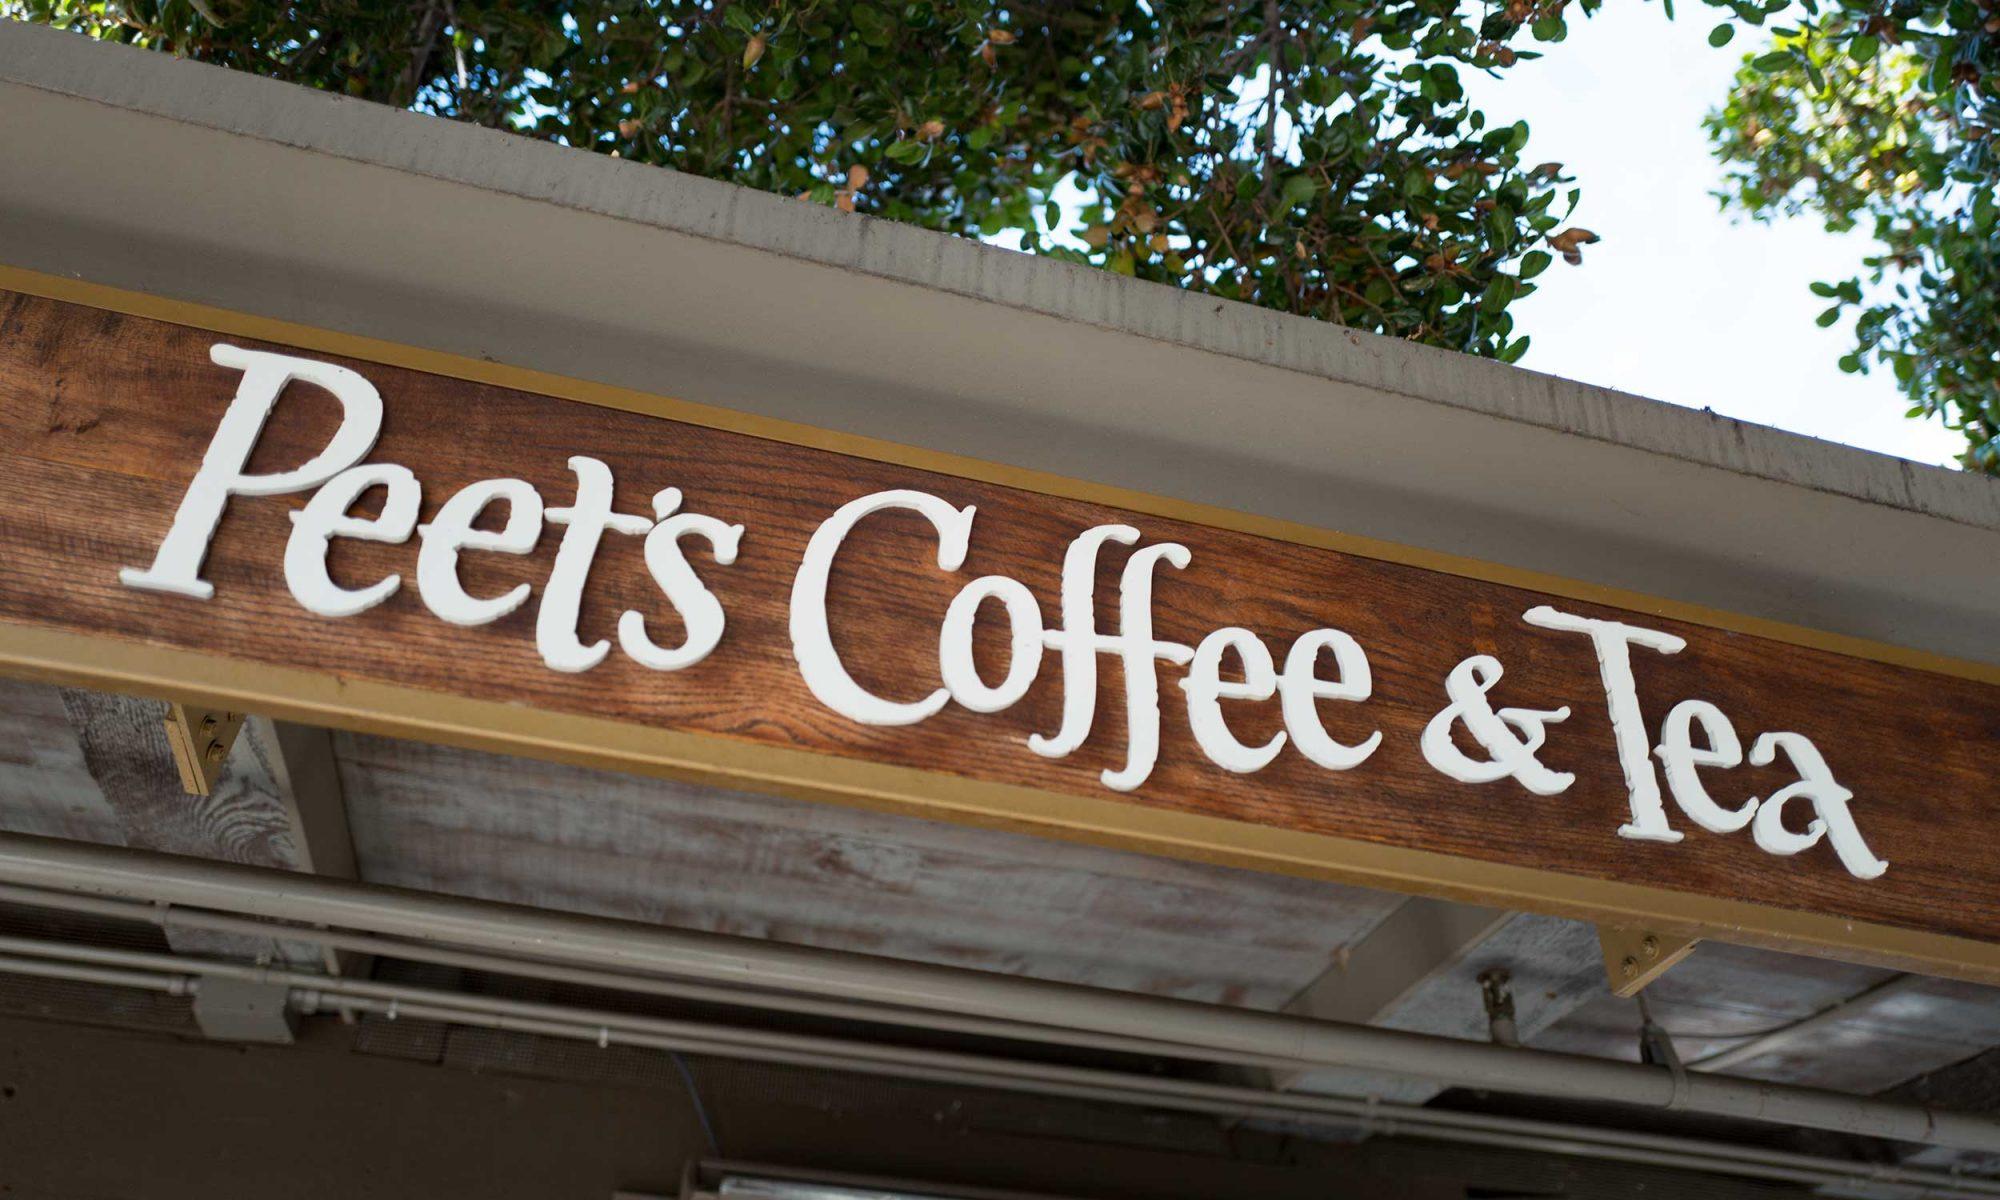 EC: Peet's Will Give Away Free Coffee on May 12